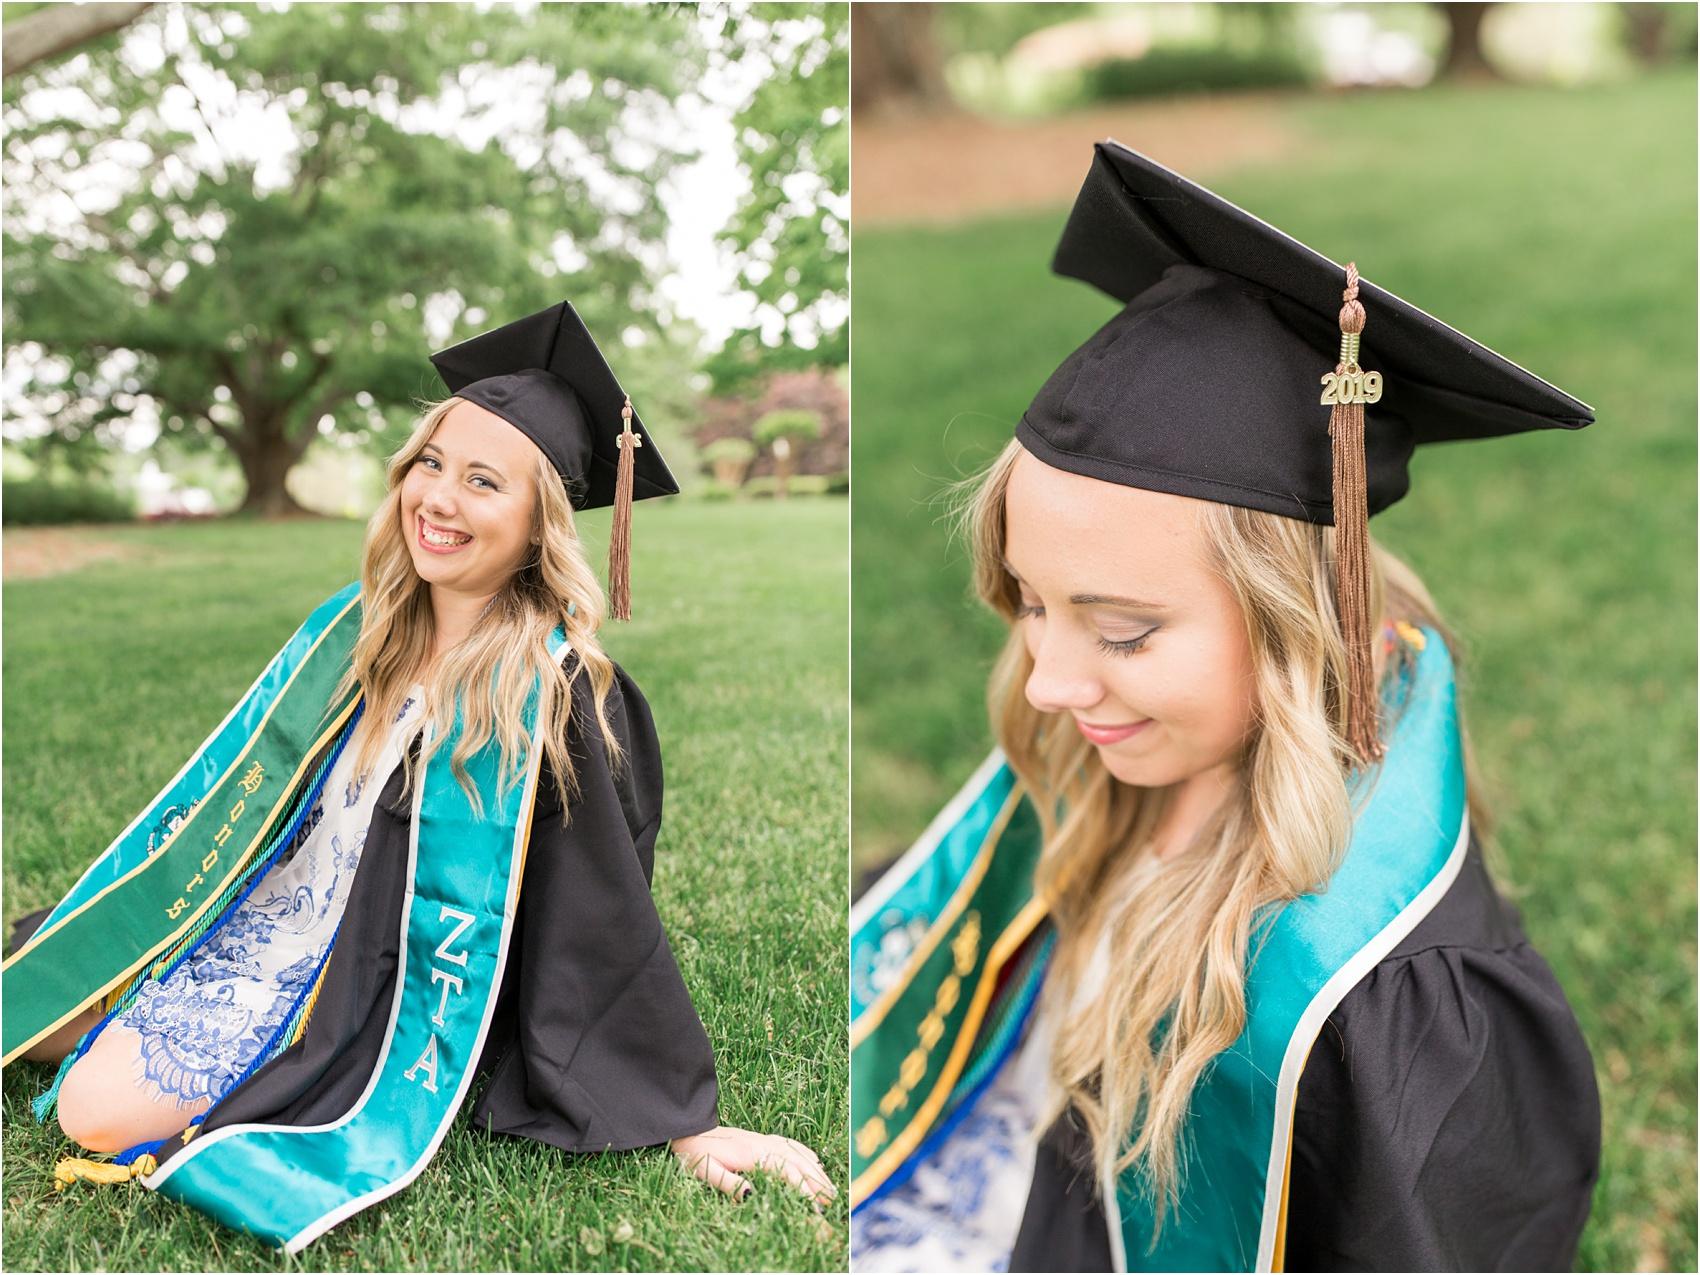 Savannah Eve Photography- Avery Miller's Grad Pics-65.jpg